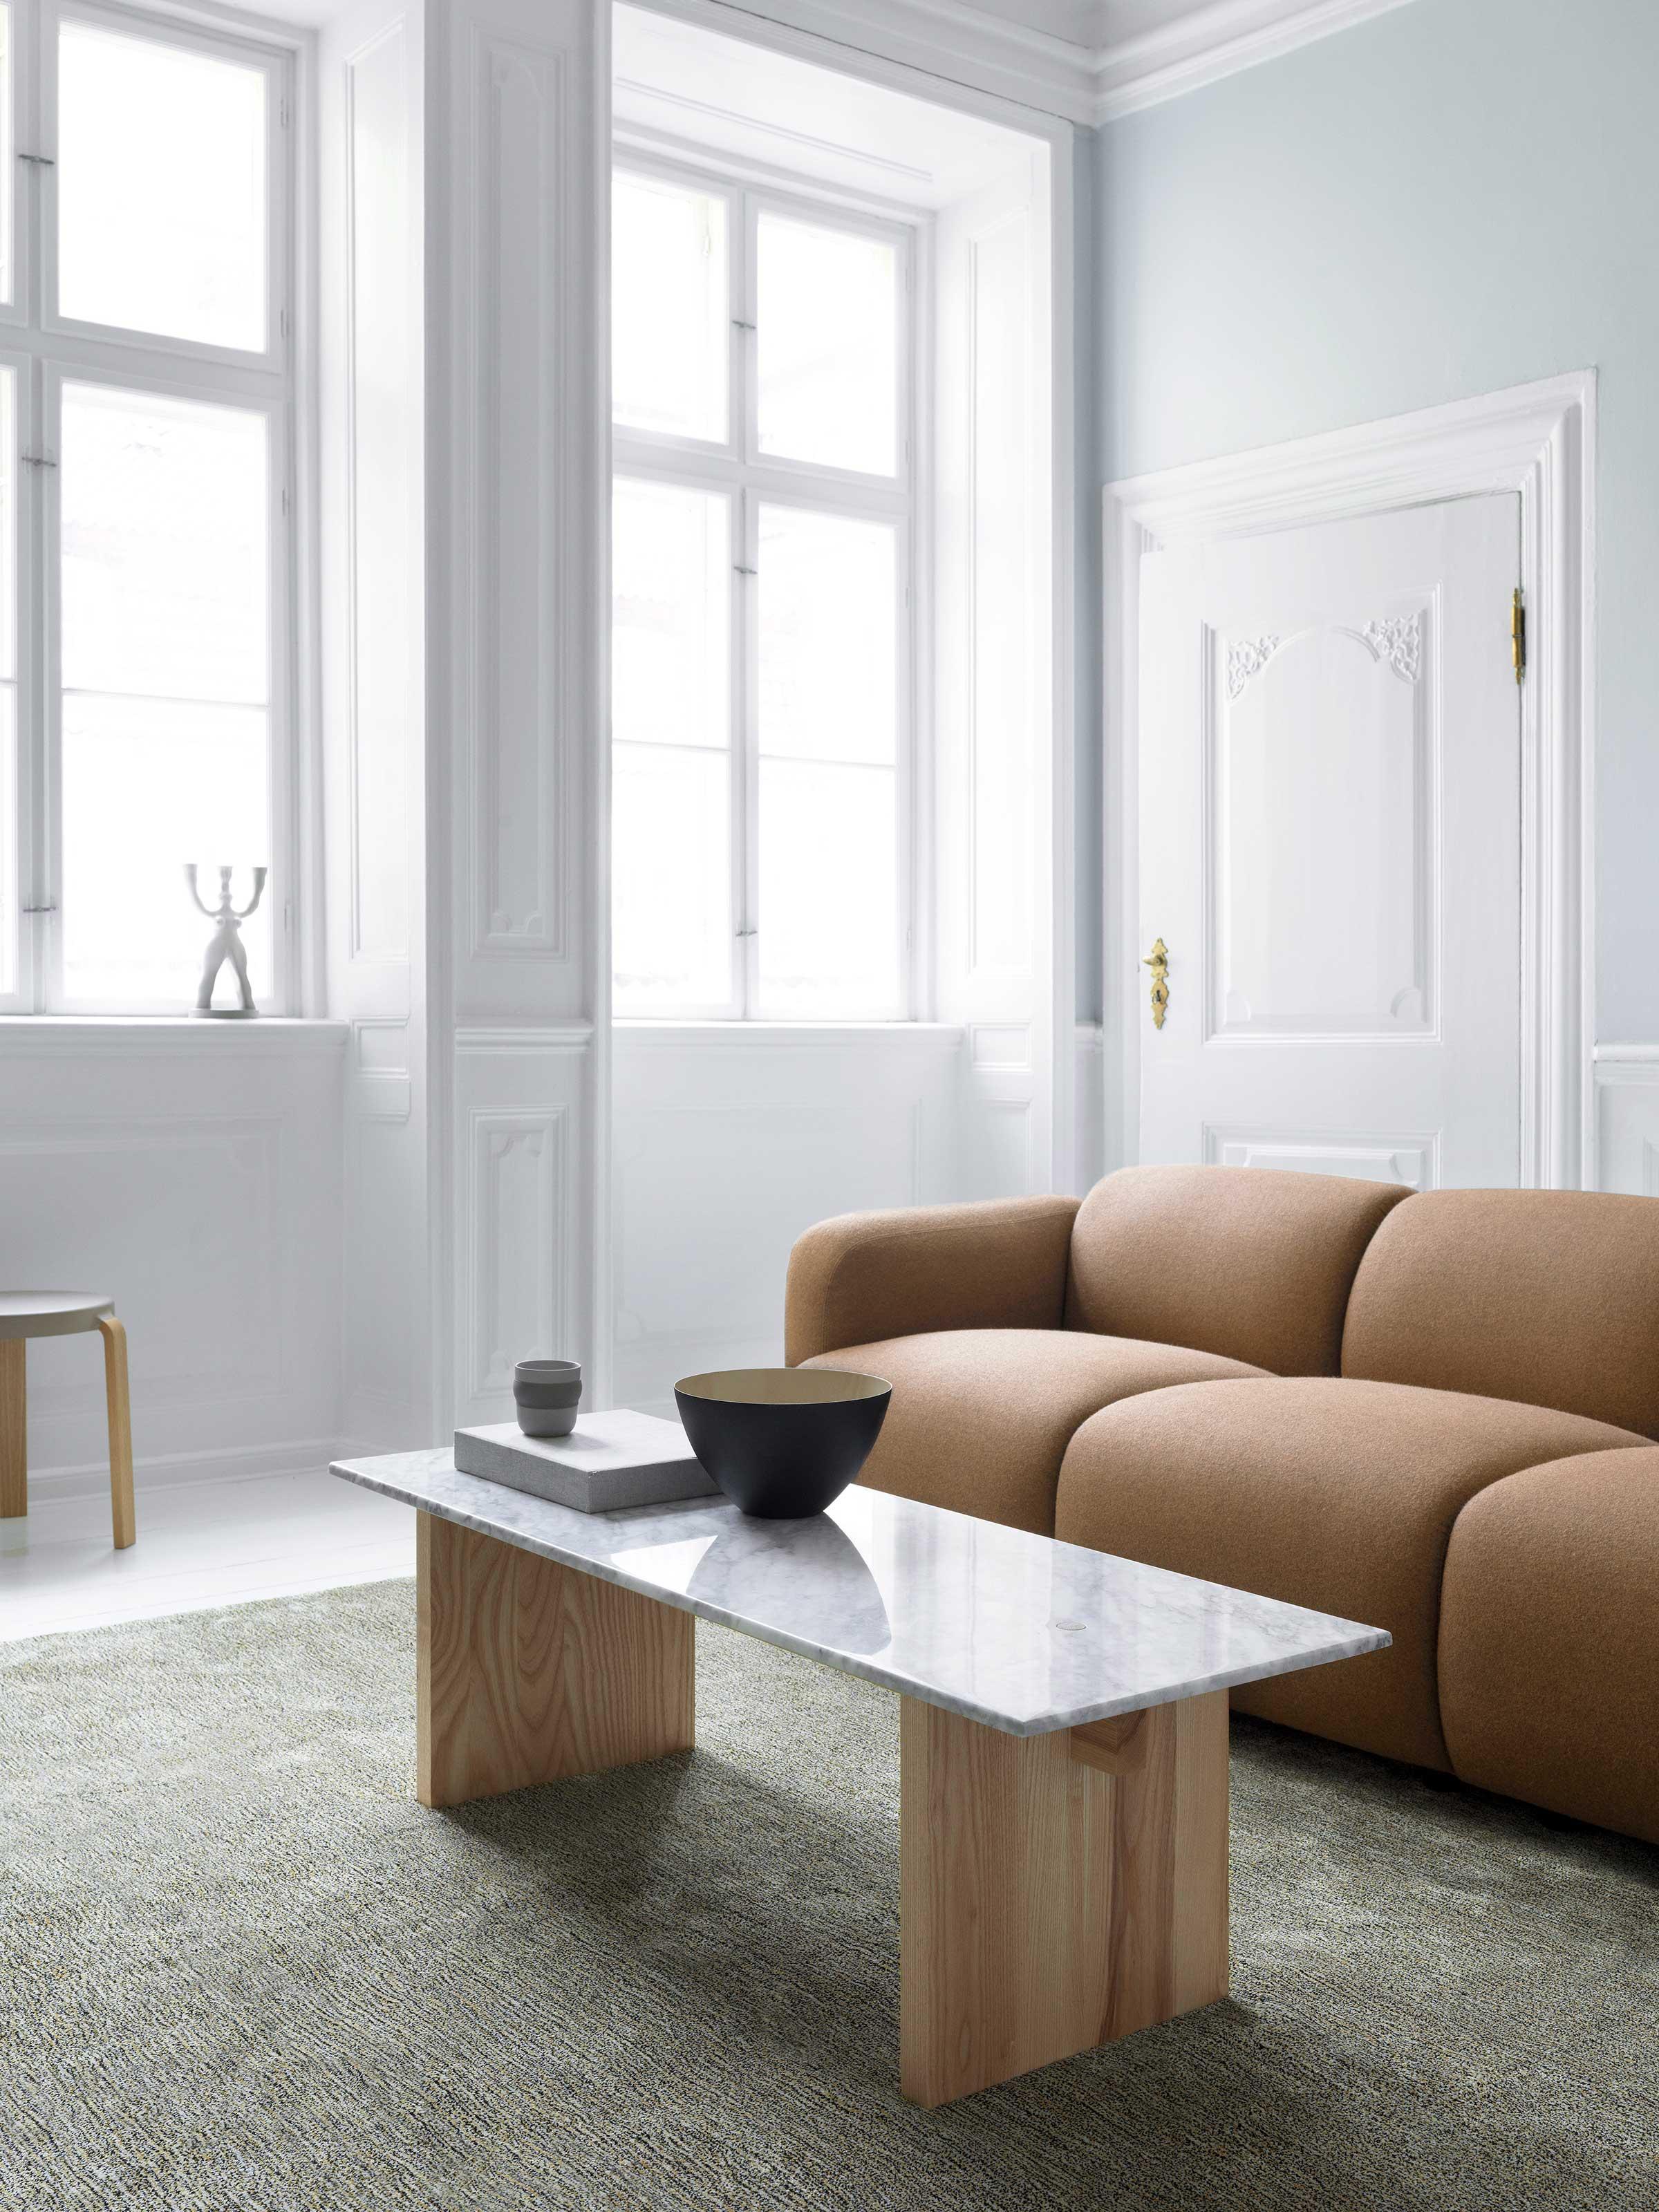 Normann Copenhagen - Best Scandinavian Design Furniture and Homewares Brands